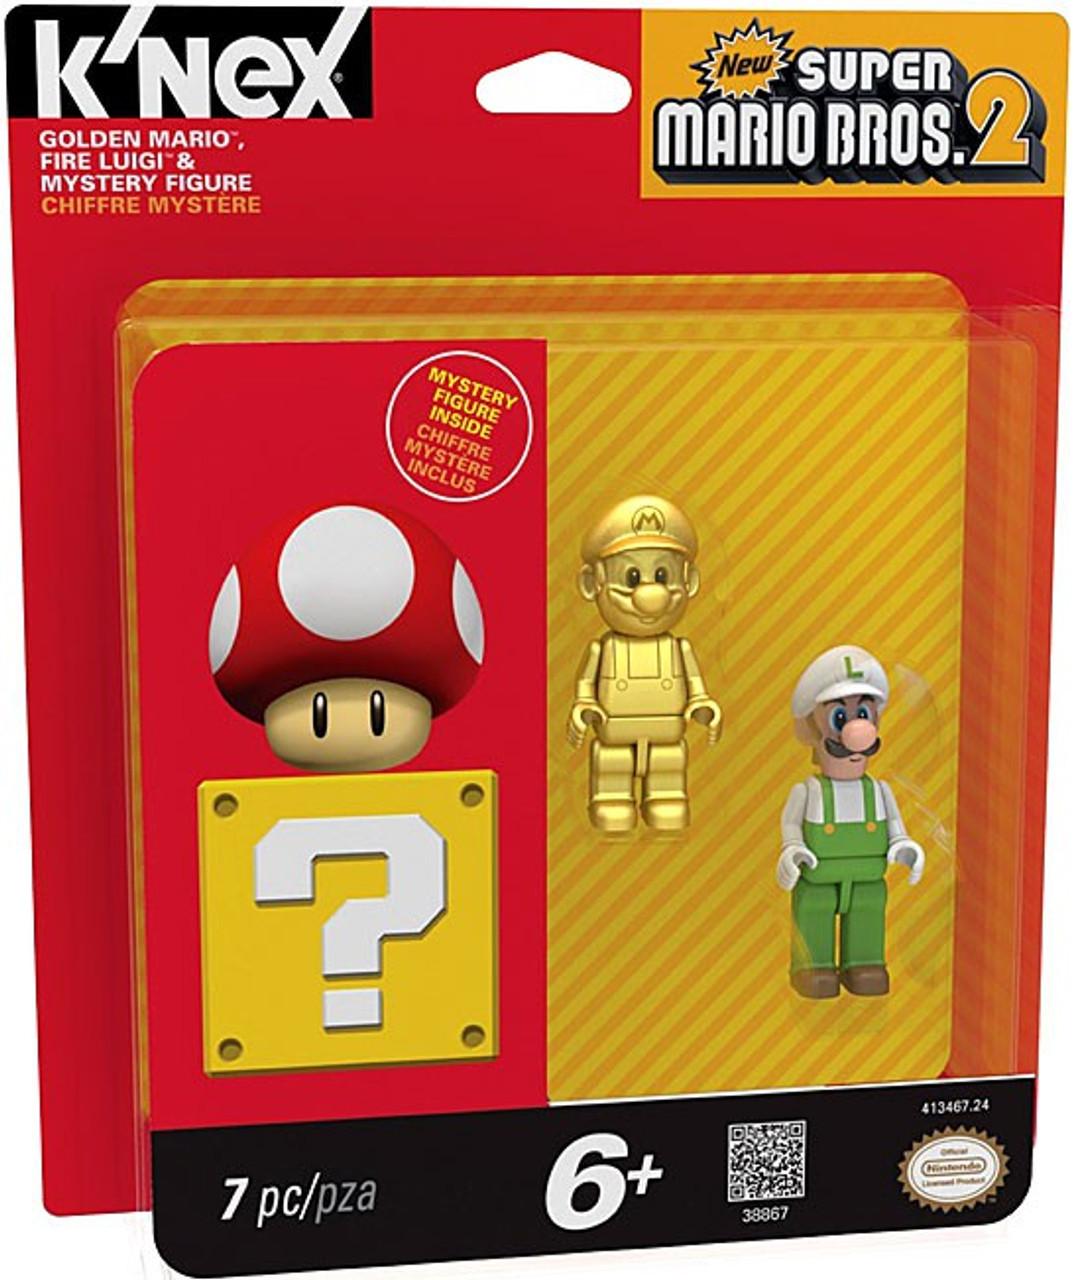 K'NEX New Super Mario Bros 2 Golden Mario, Fire Luigi & Mystery Figure  3-Pack